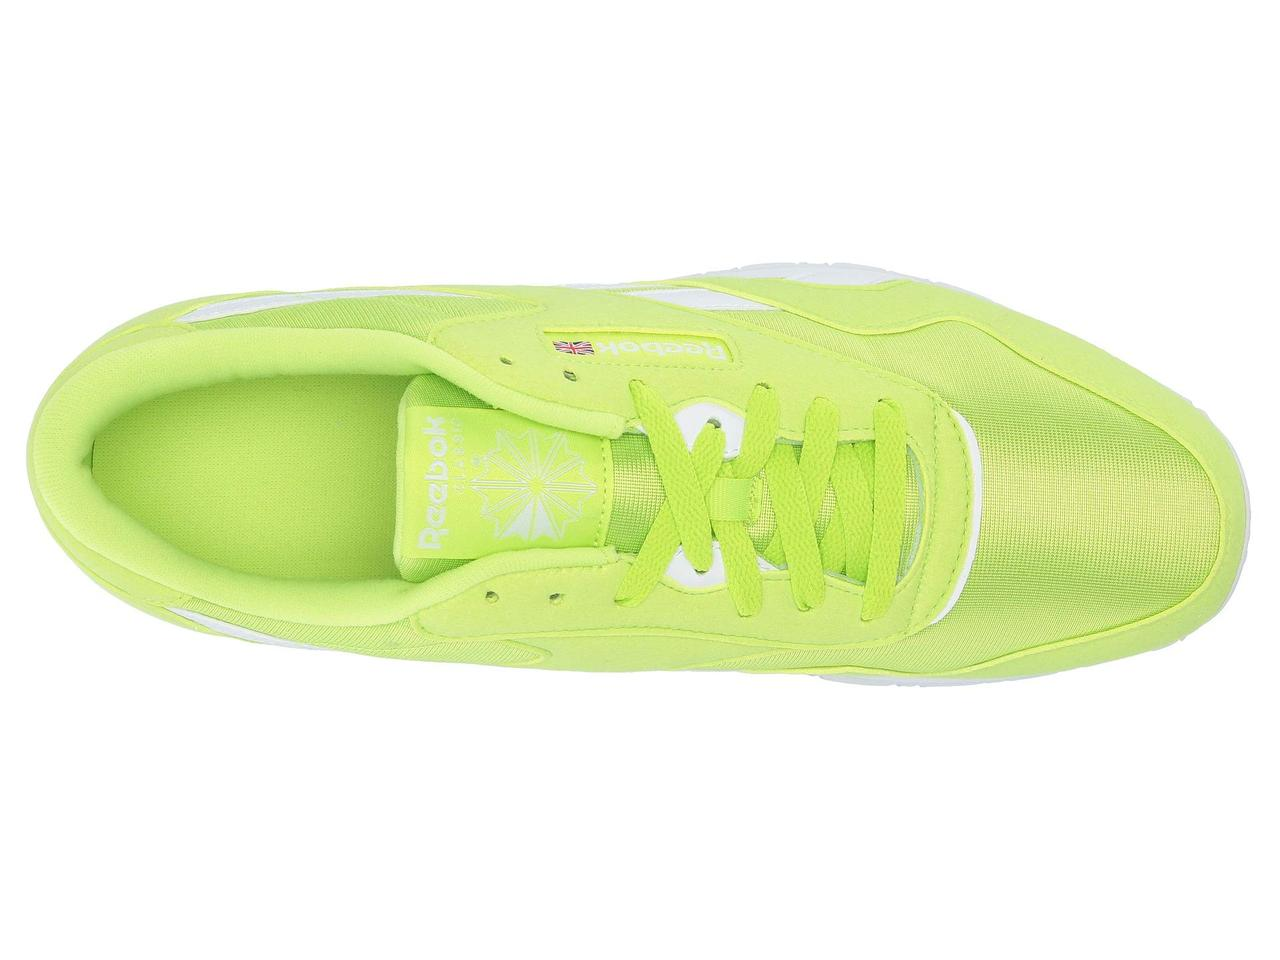 0a5060312a5f ... Кроссовки/Кеды (Оригинал) Reebok Lifestyle Classic Nylon Color Neon Lime /White, ...